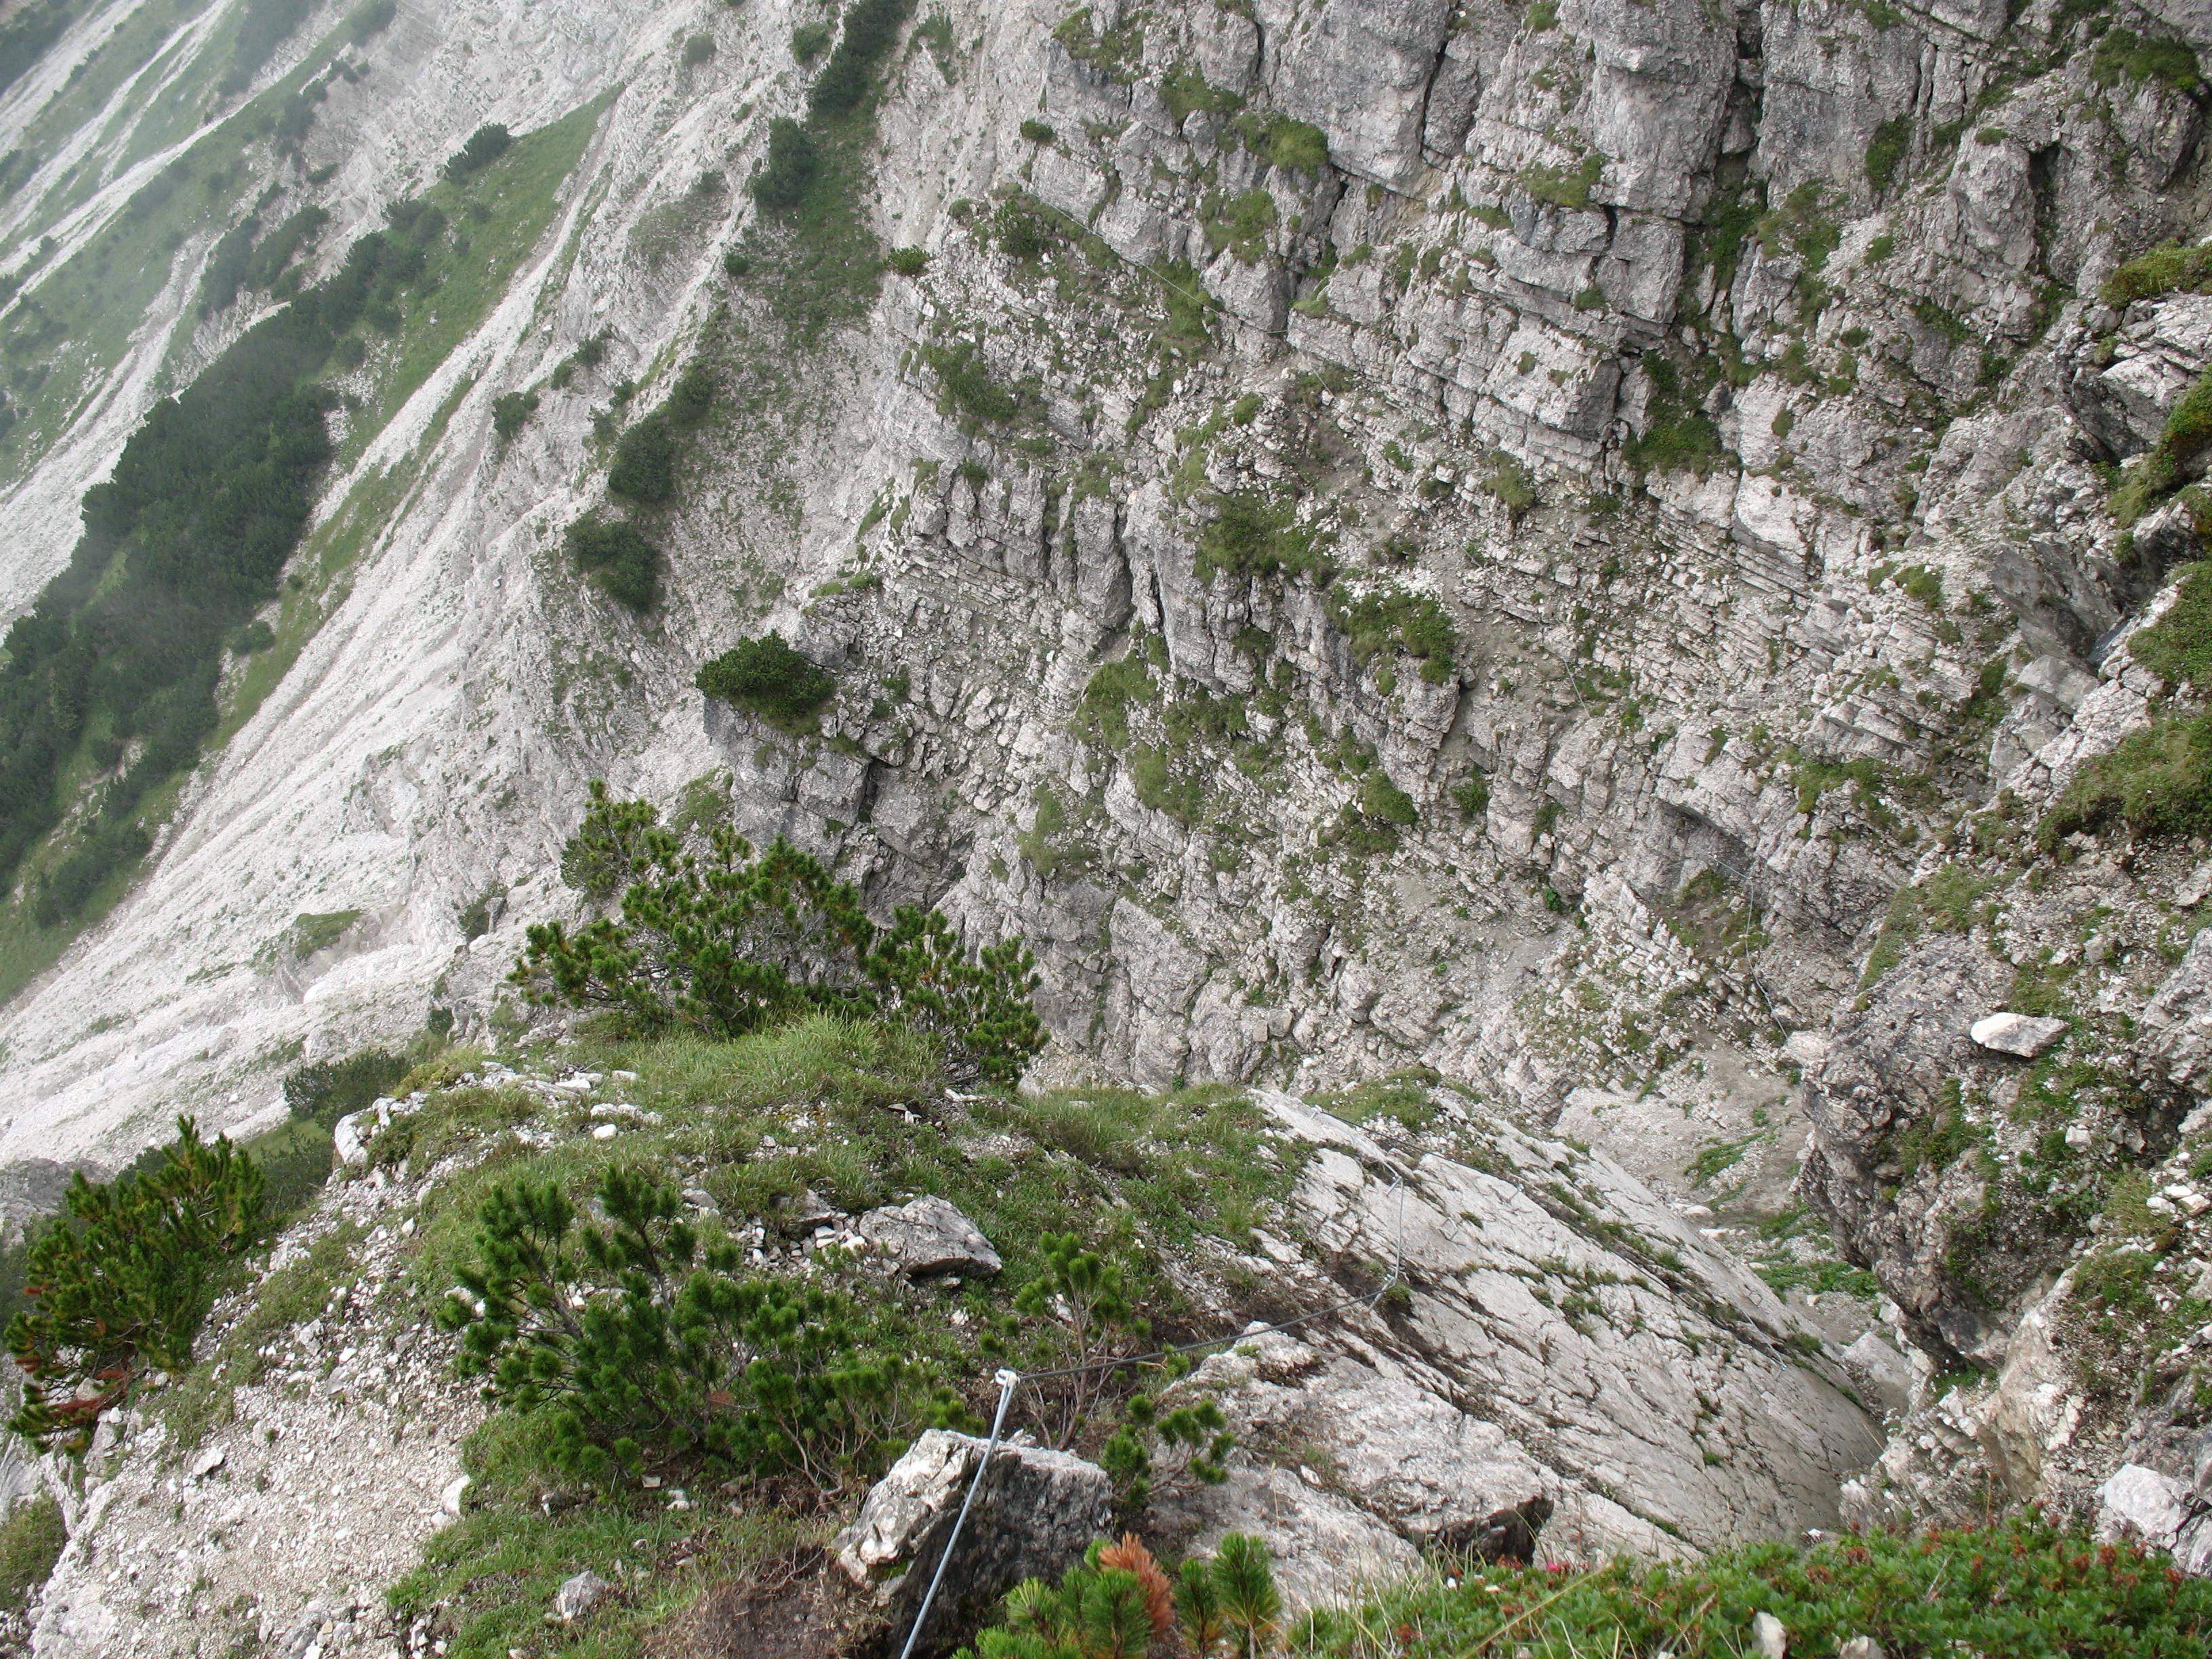 Klettersteig Iseler : Datei iseler klettersteig beginn teil g u wikipedia